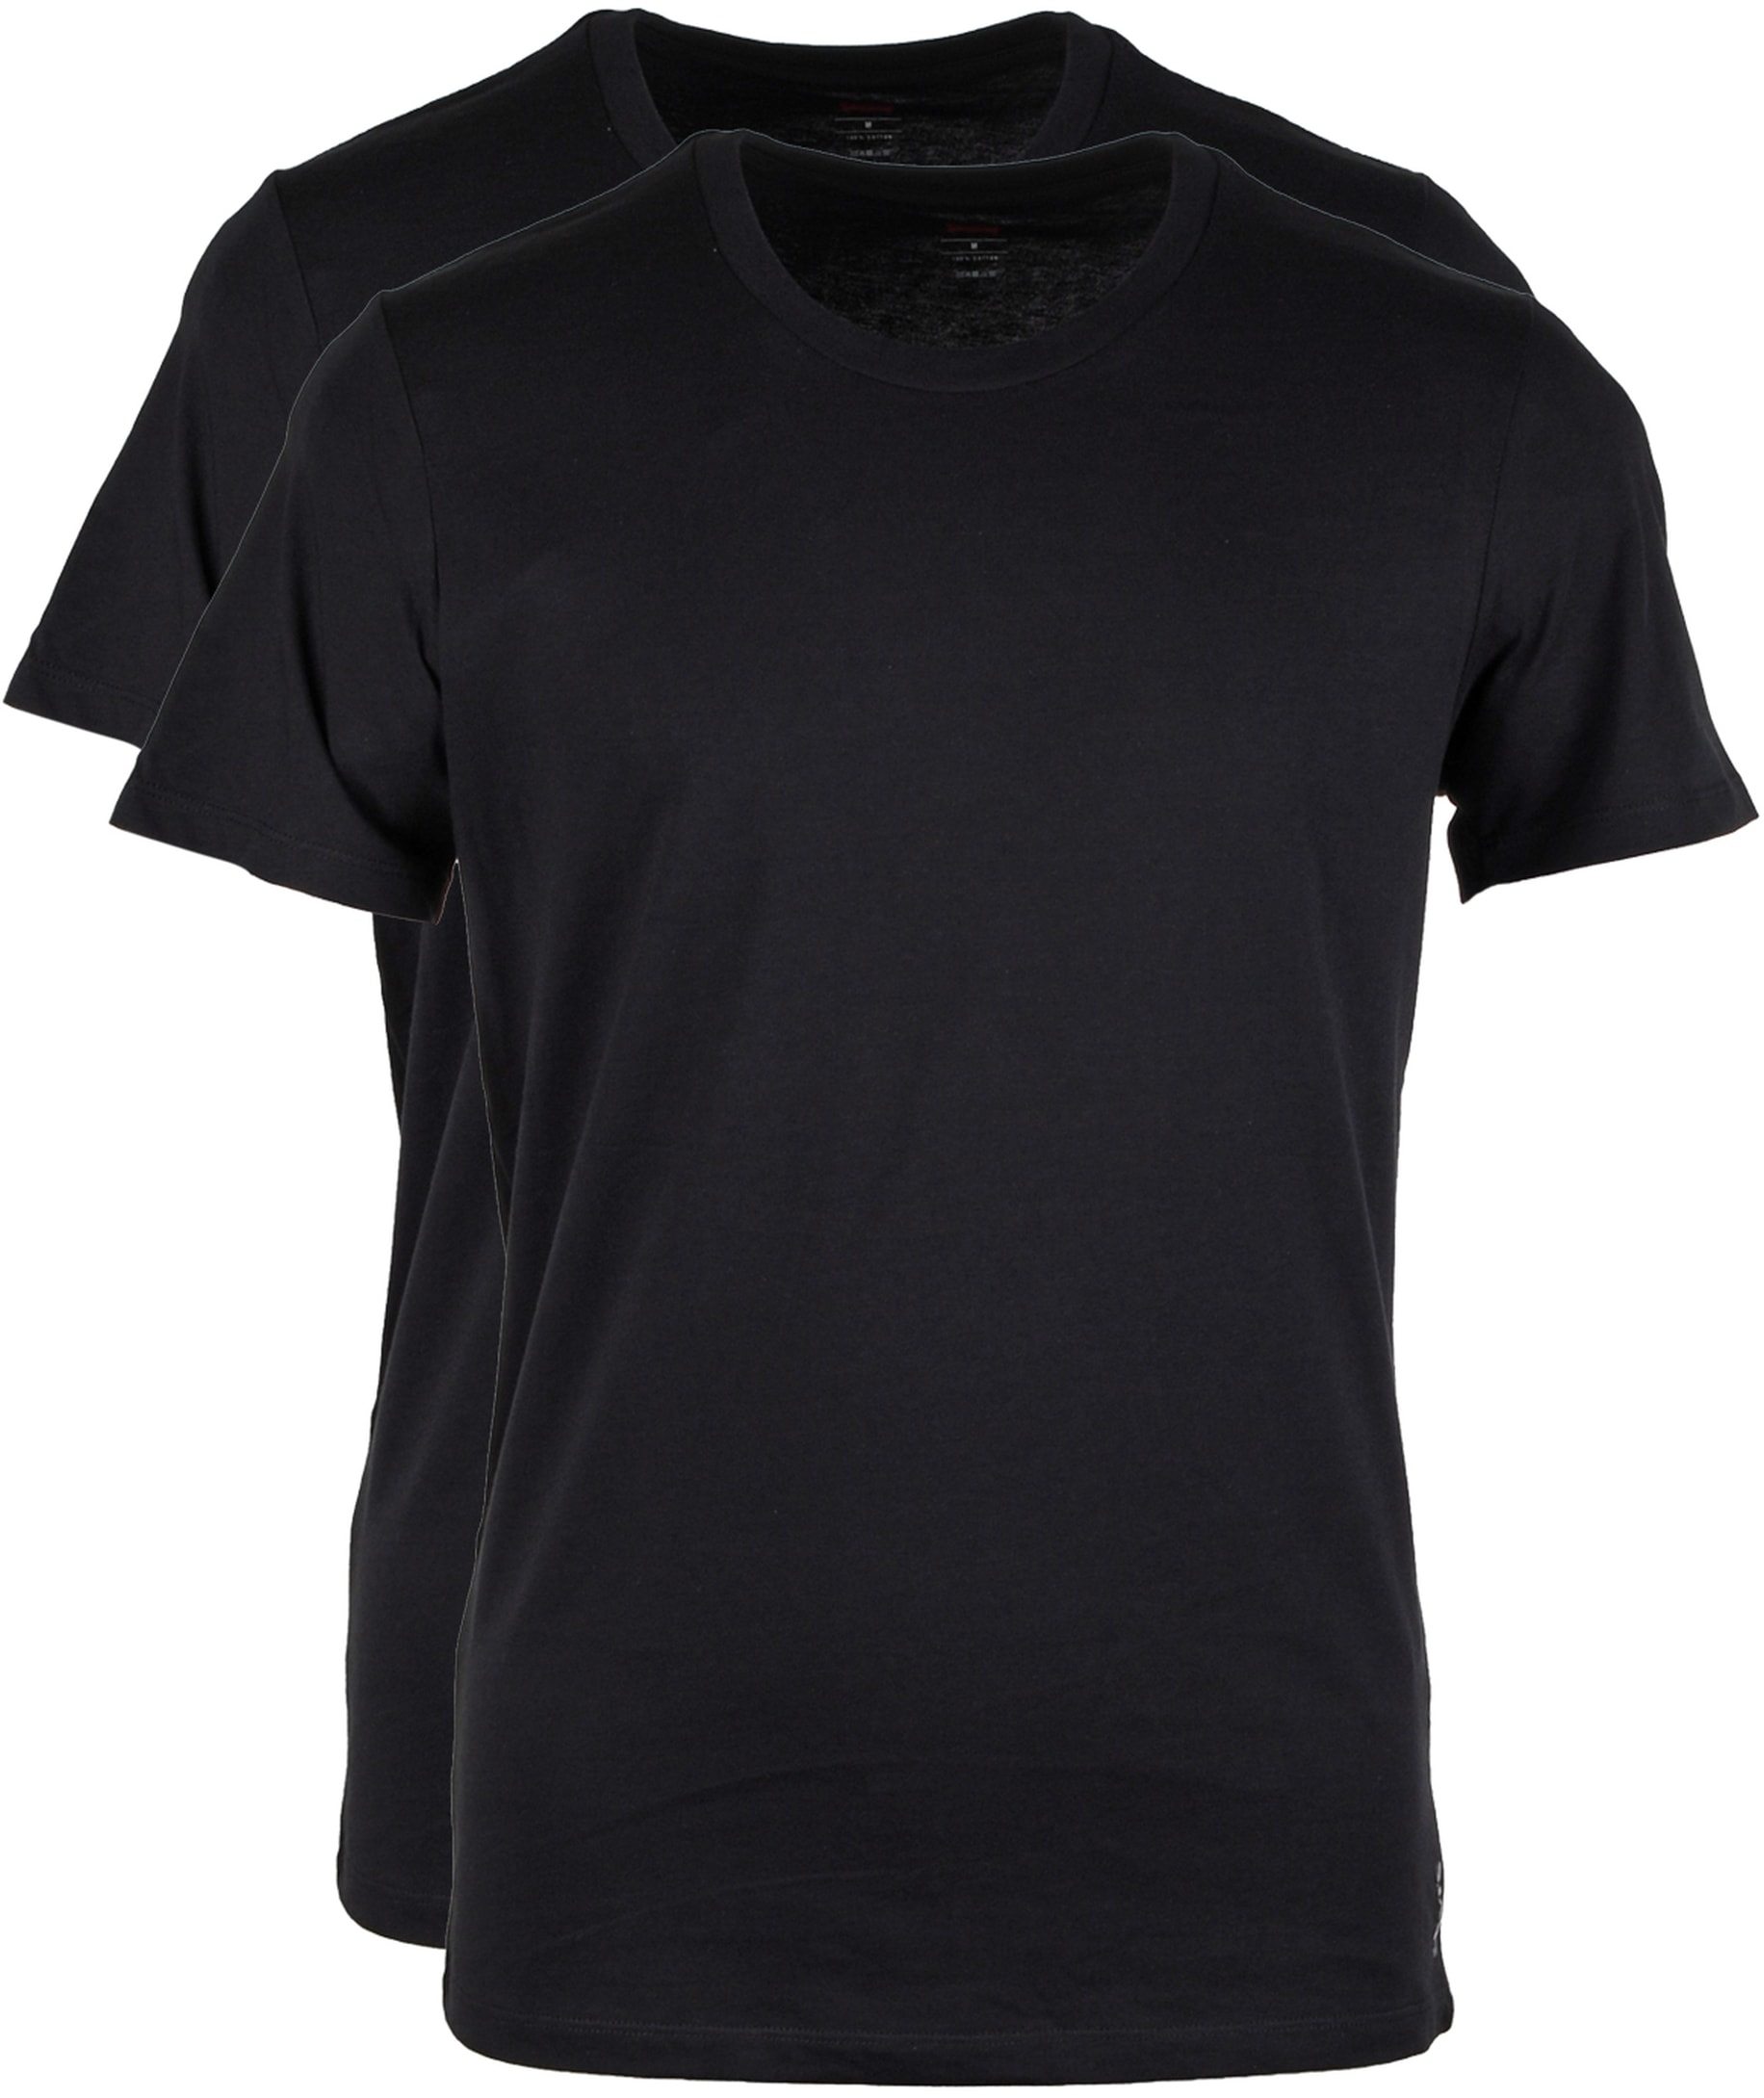 Levi's T-shirt Ronde Hals Zwart 2Pack foto 0